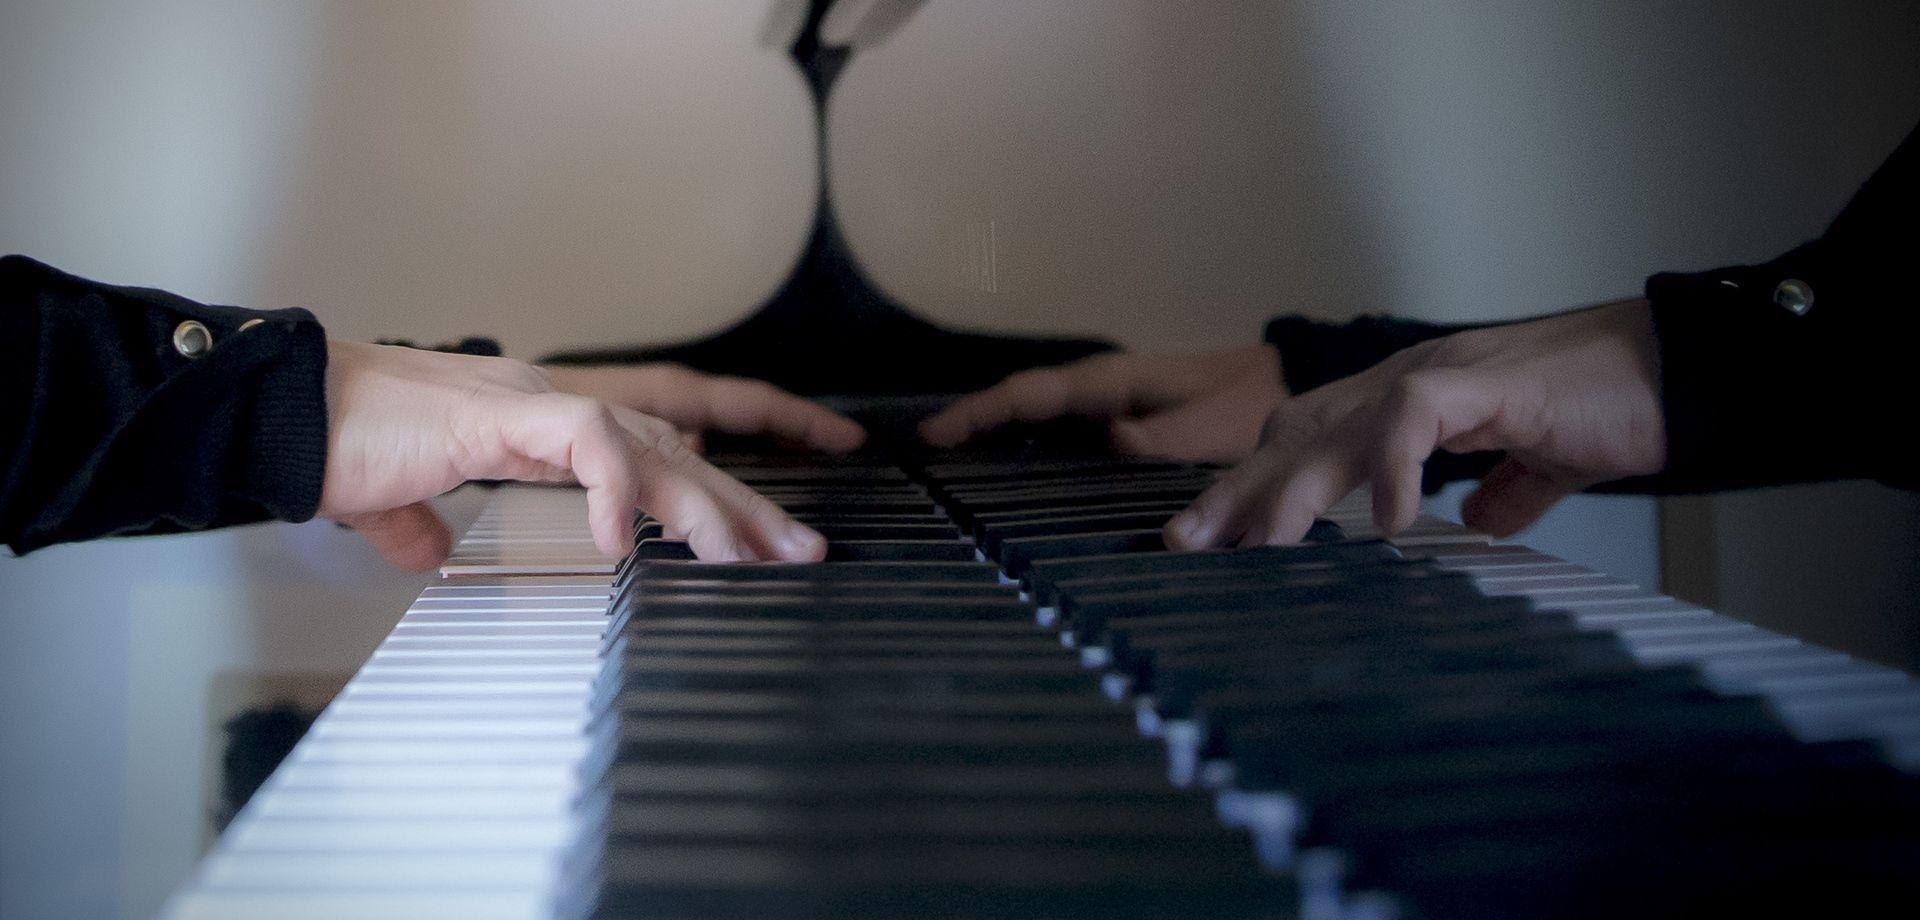 marta zabaleta manos pianista